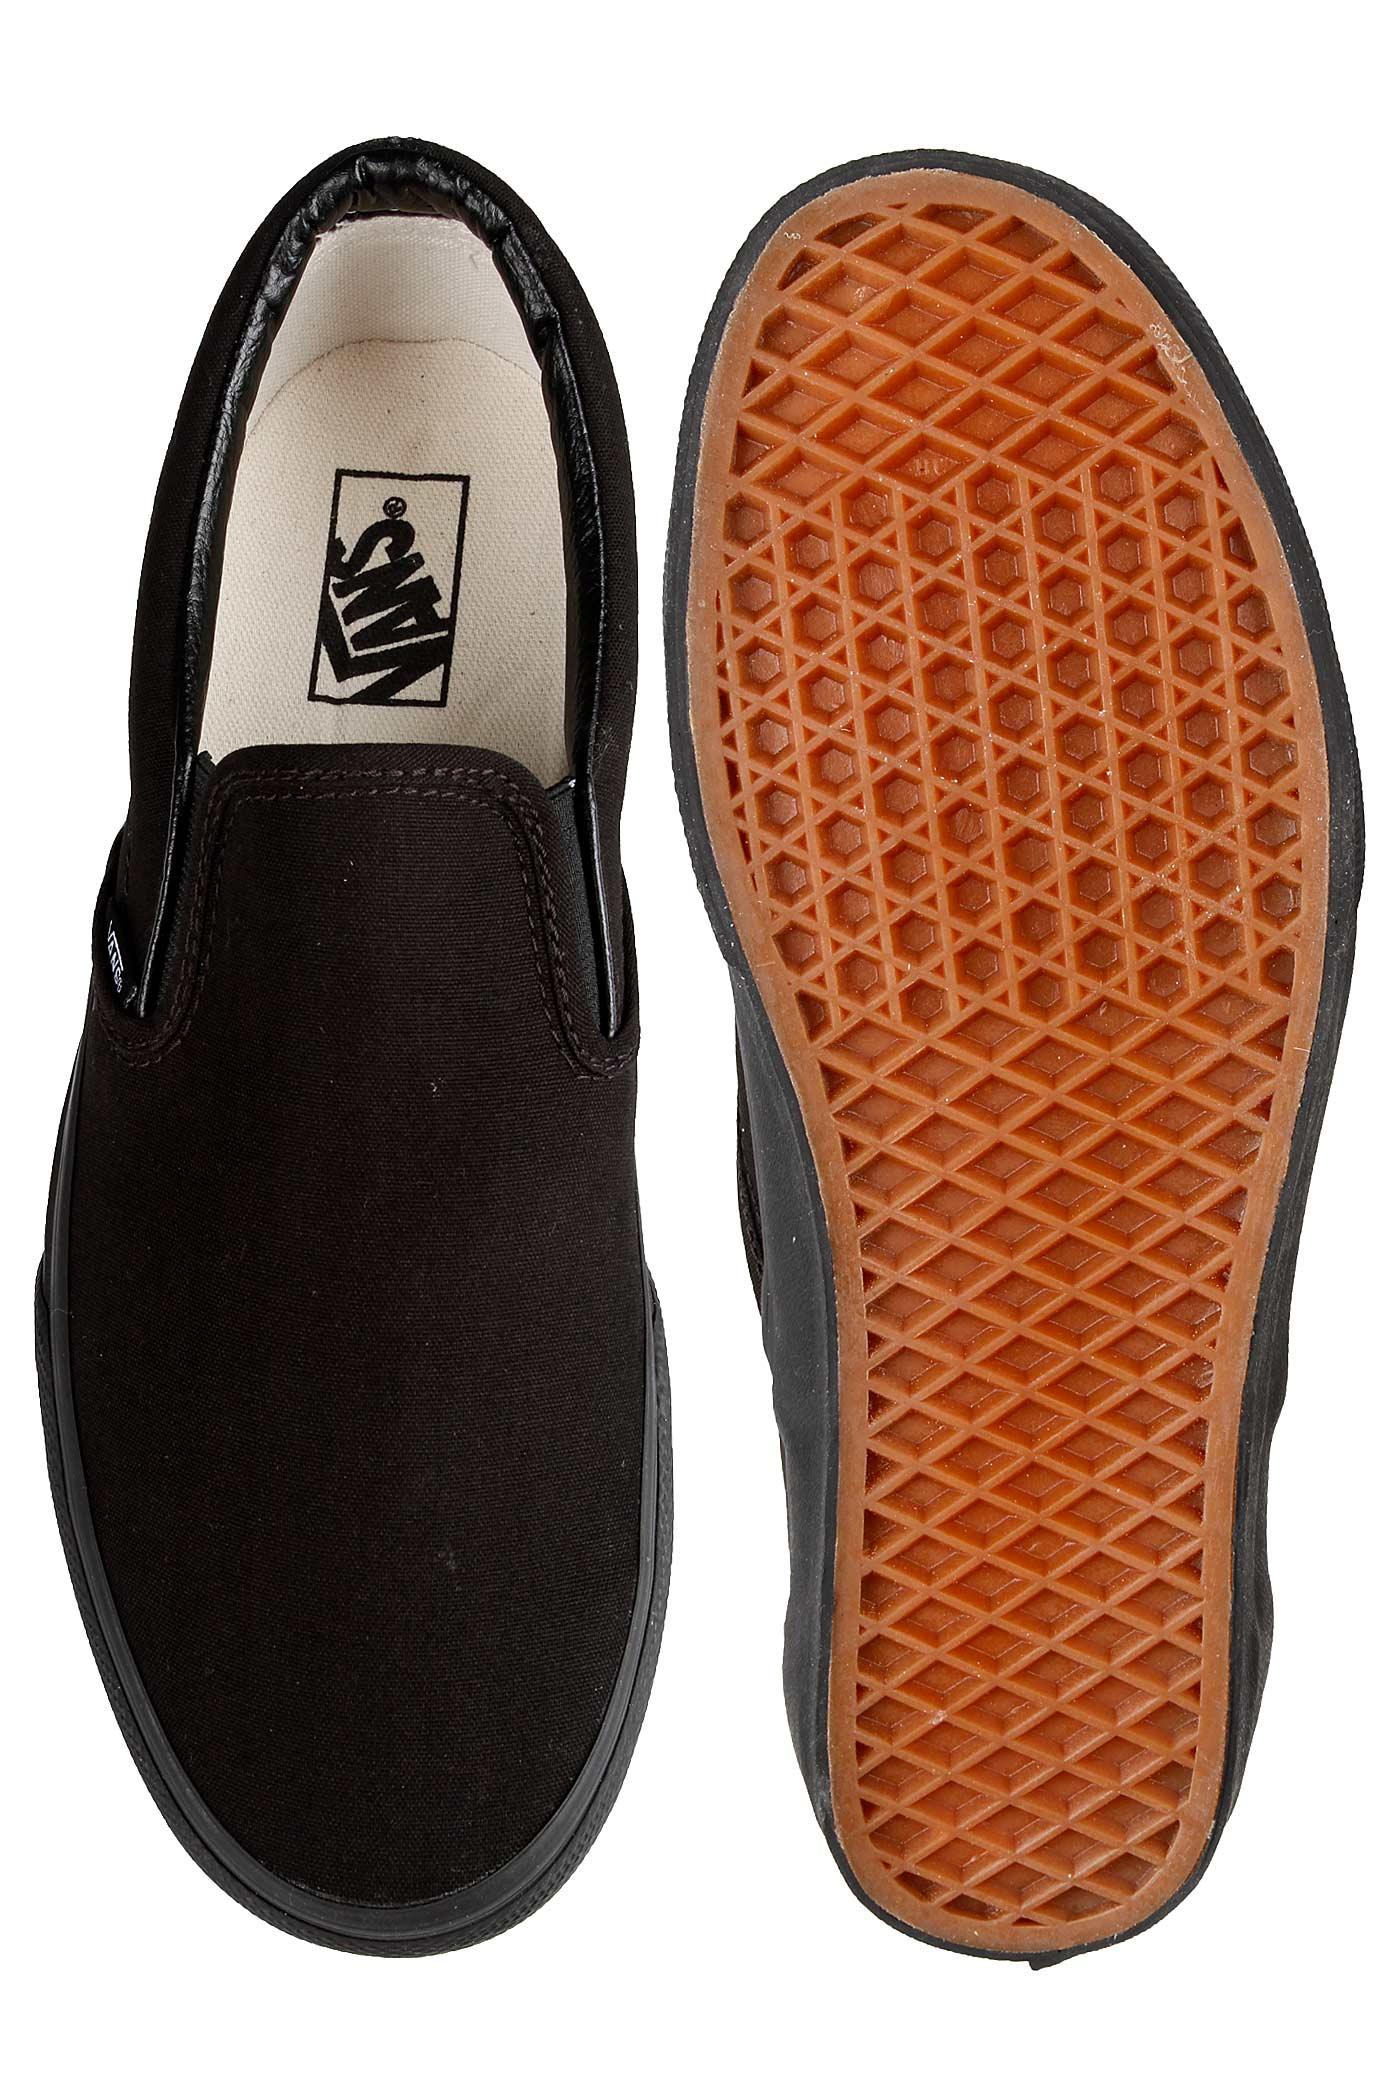 Black Vans Classic on Slip Chaussureblack UpzMVGqS